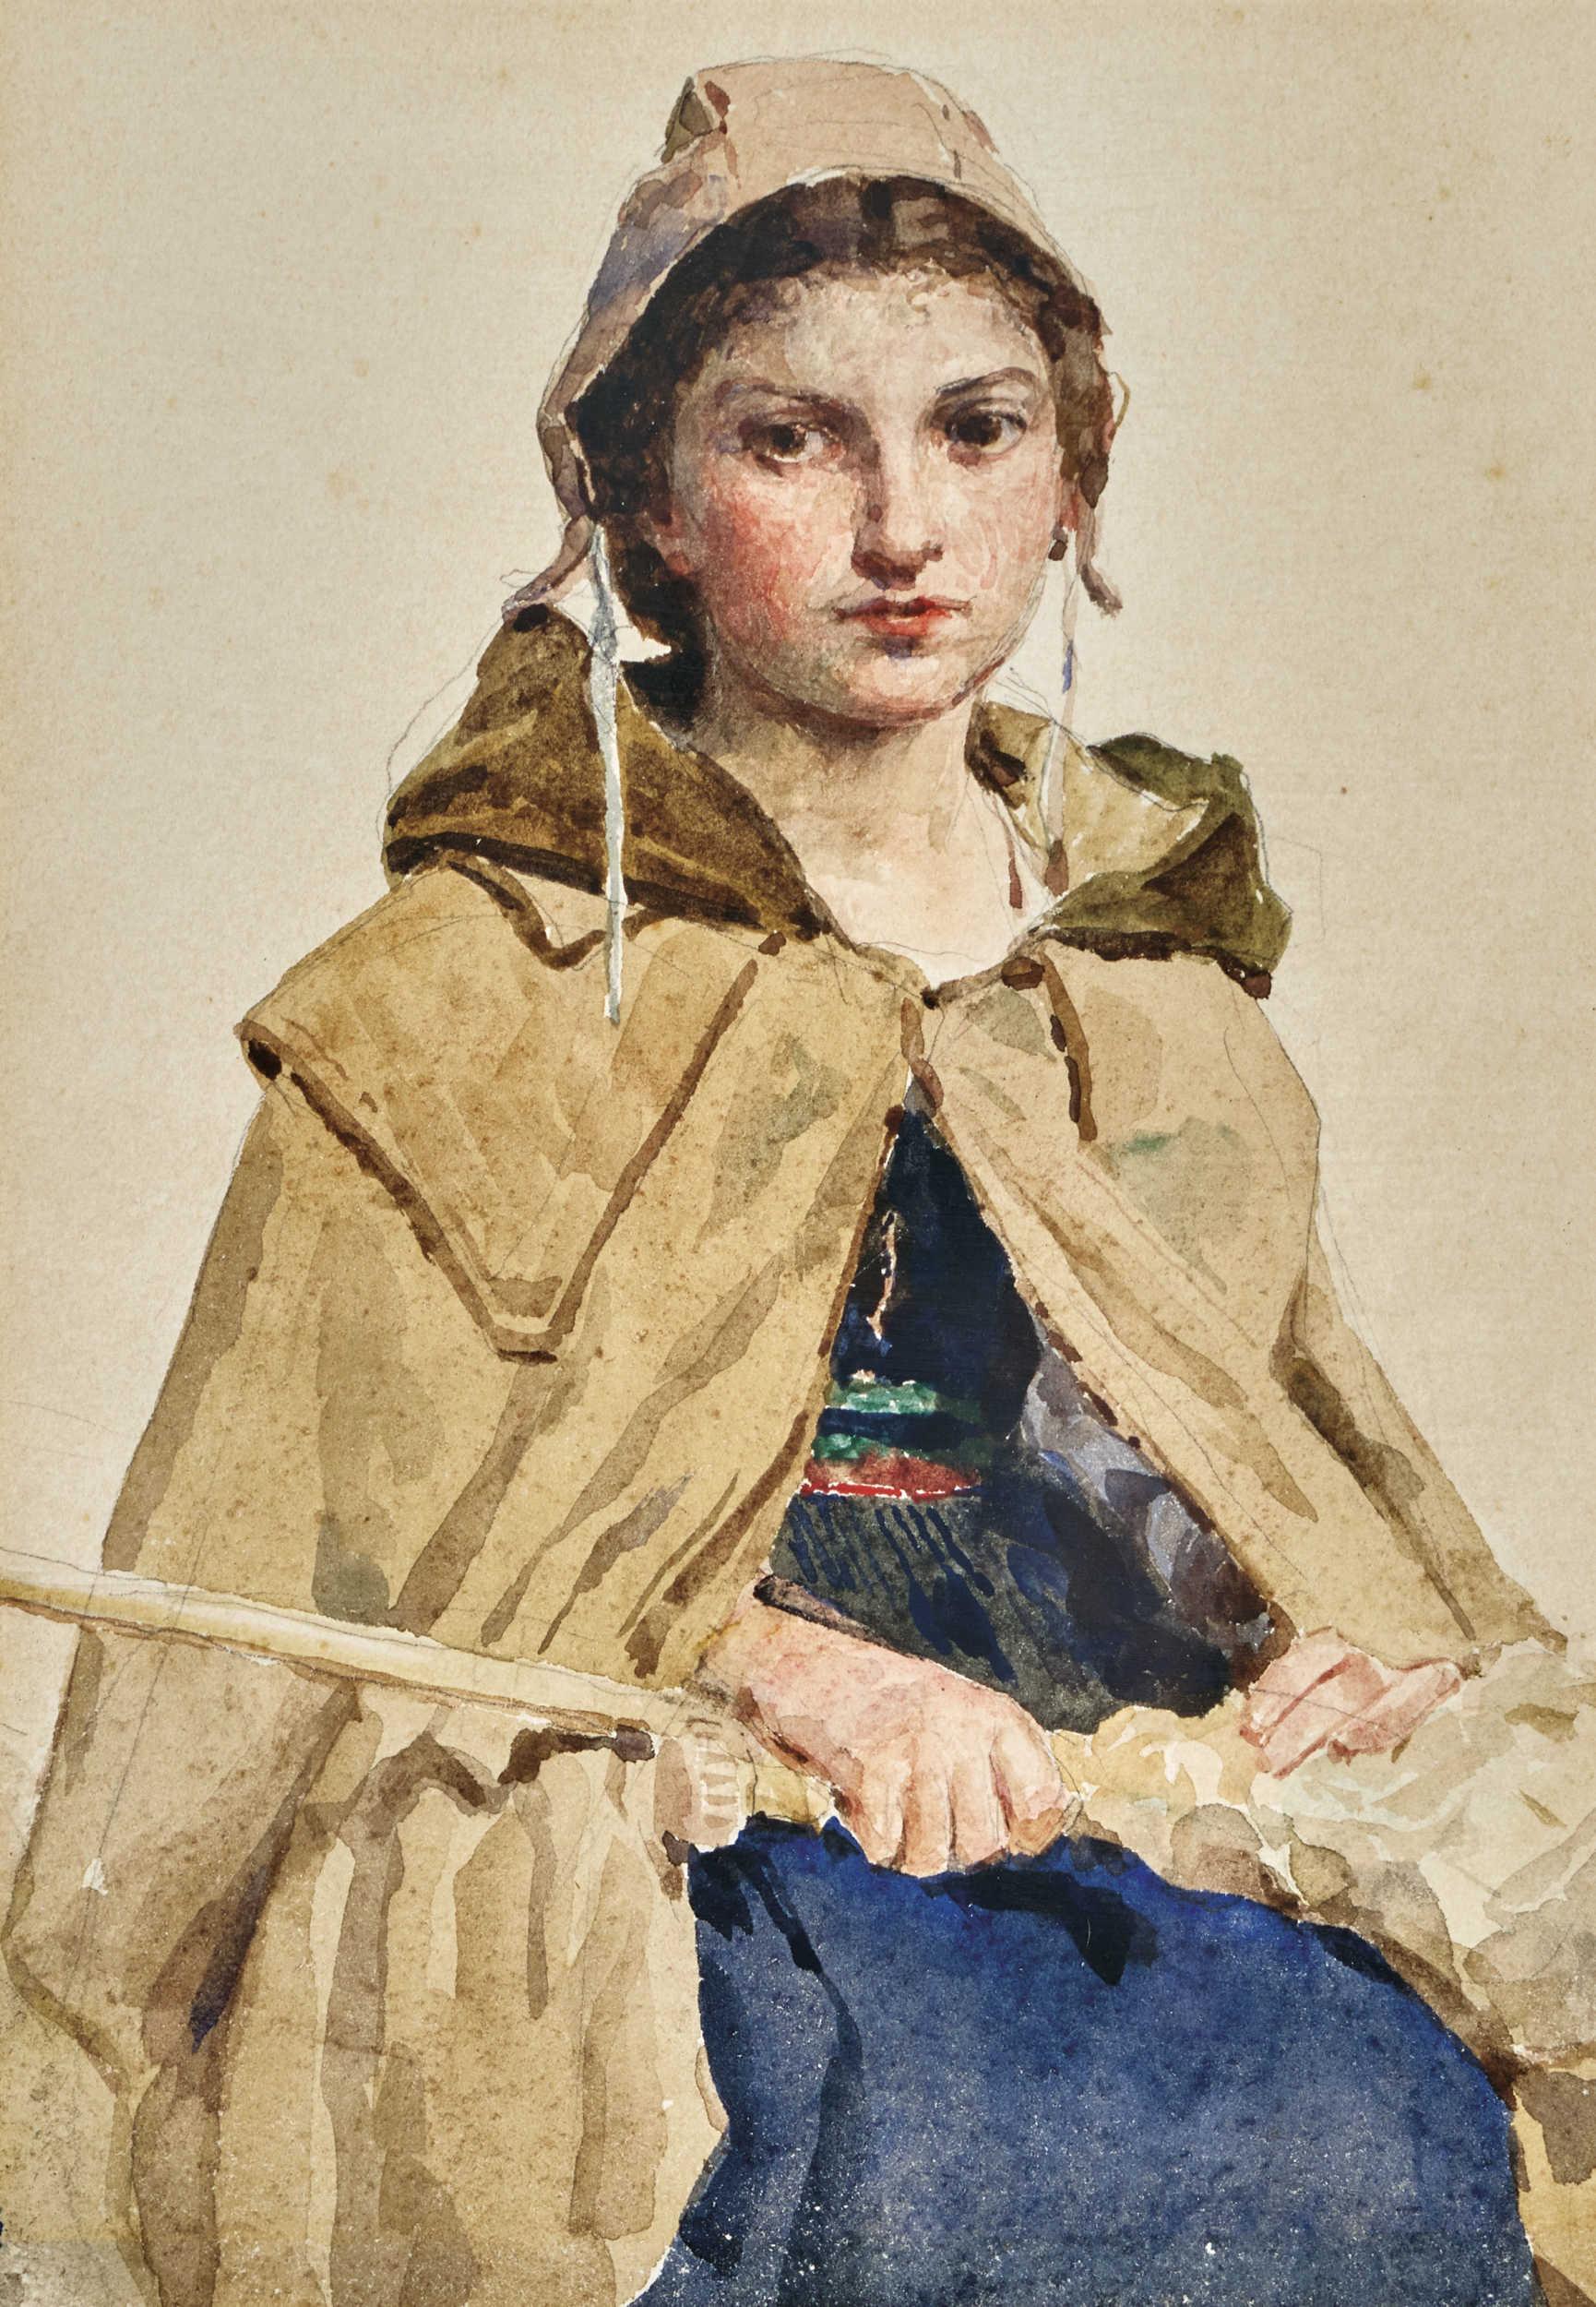 Lot 41 - ANKER, ALBERT1831 Ins 1910Mädchen mit Spinnrocken.Aquarell über Bleistift,24x17 cm (LM)